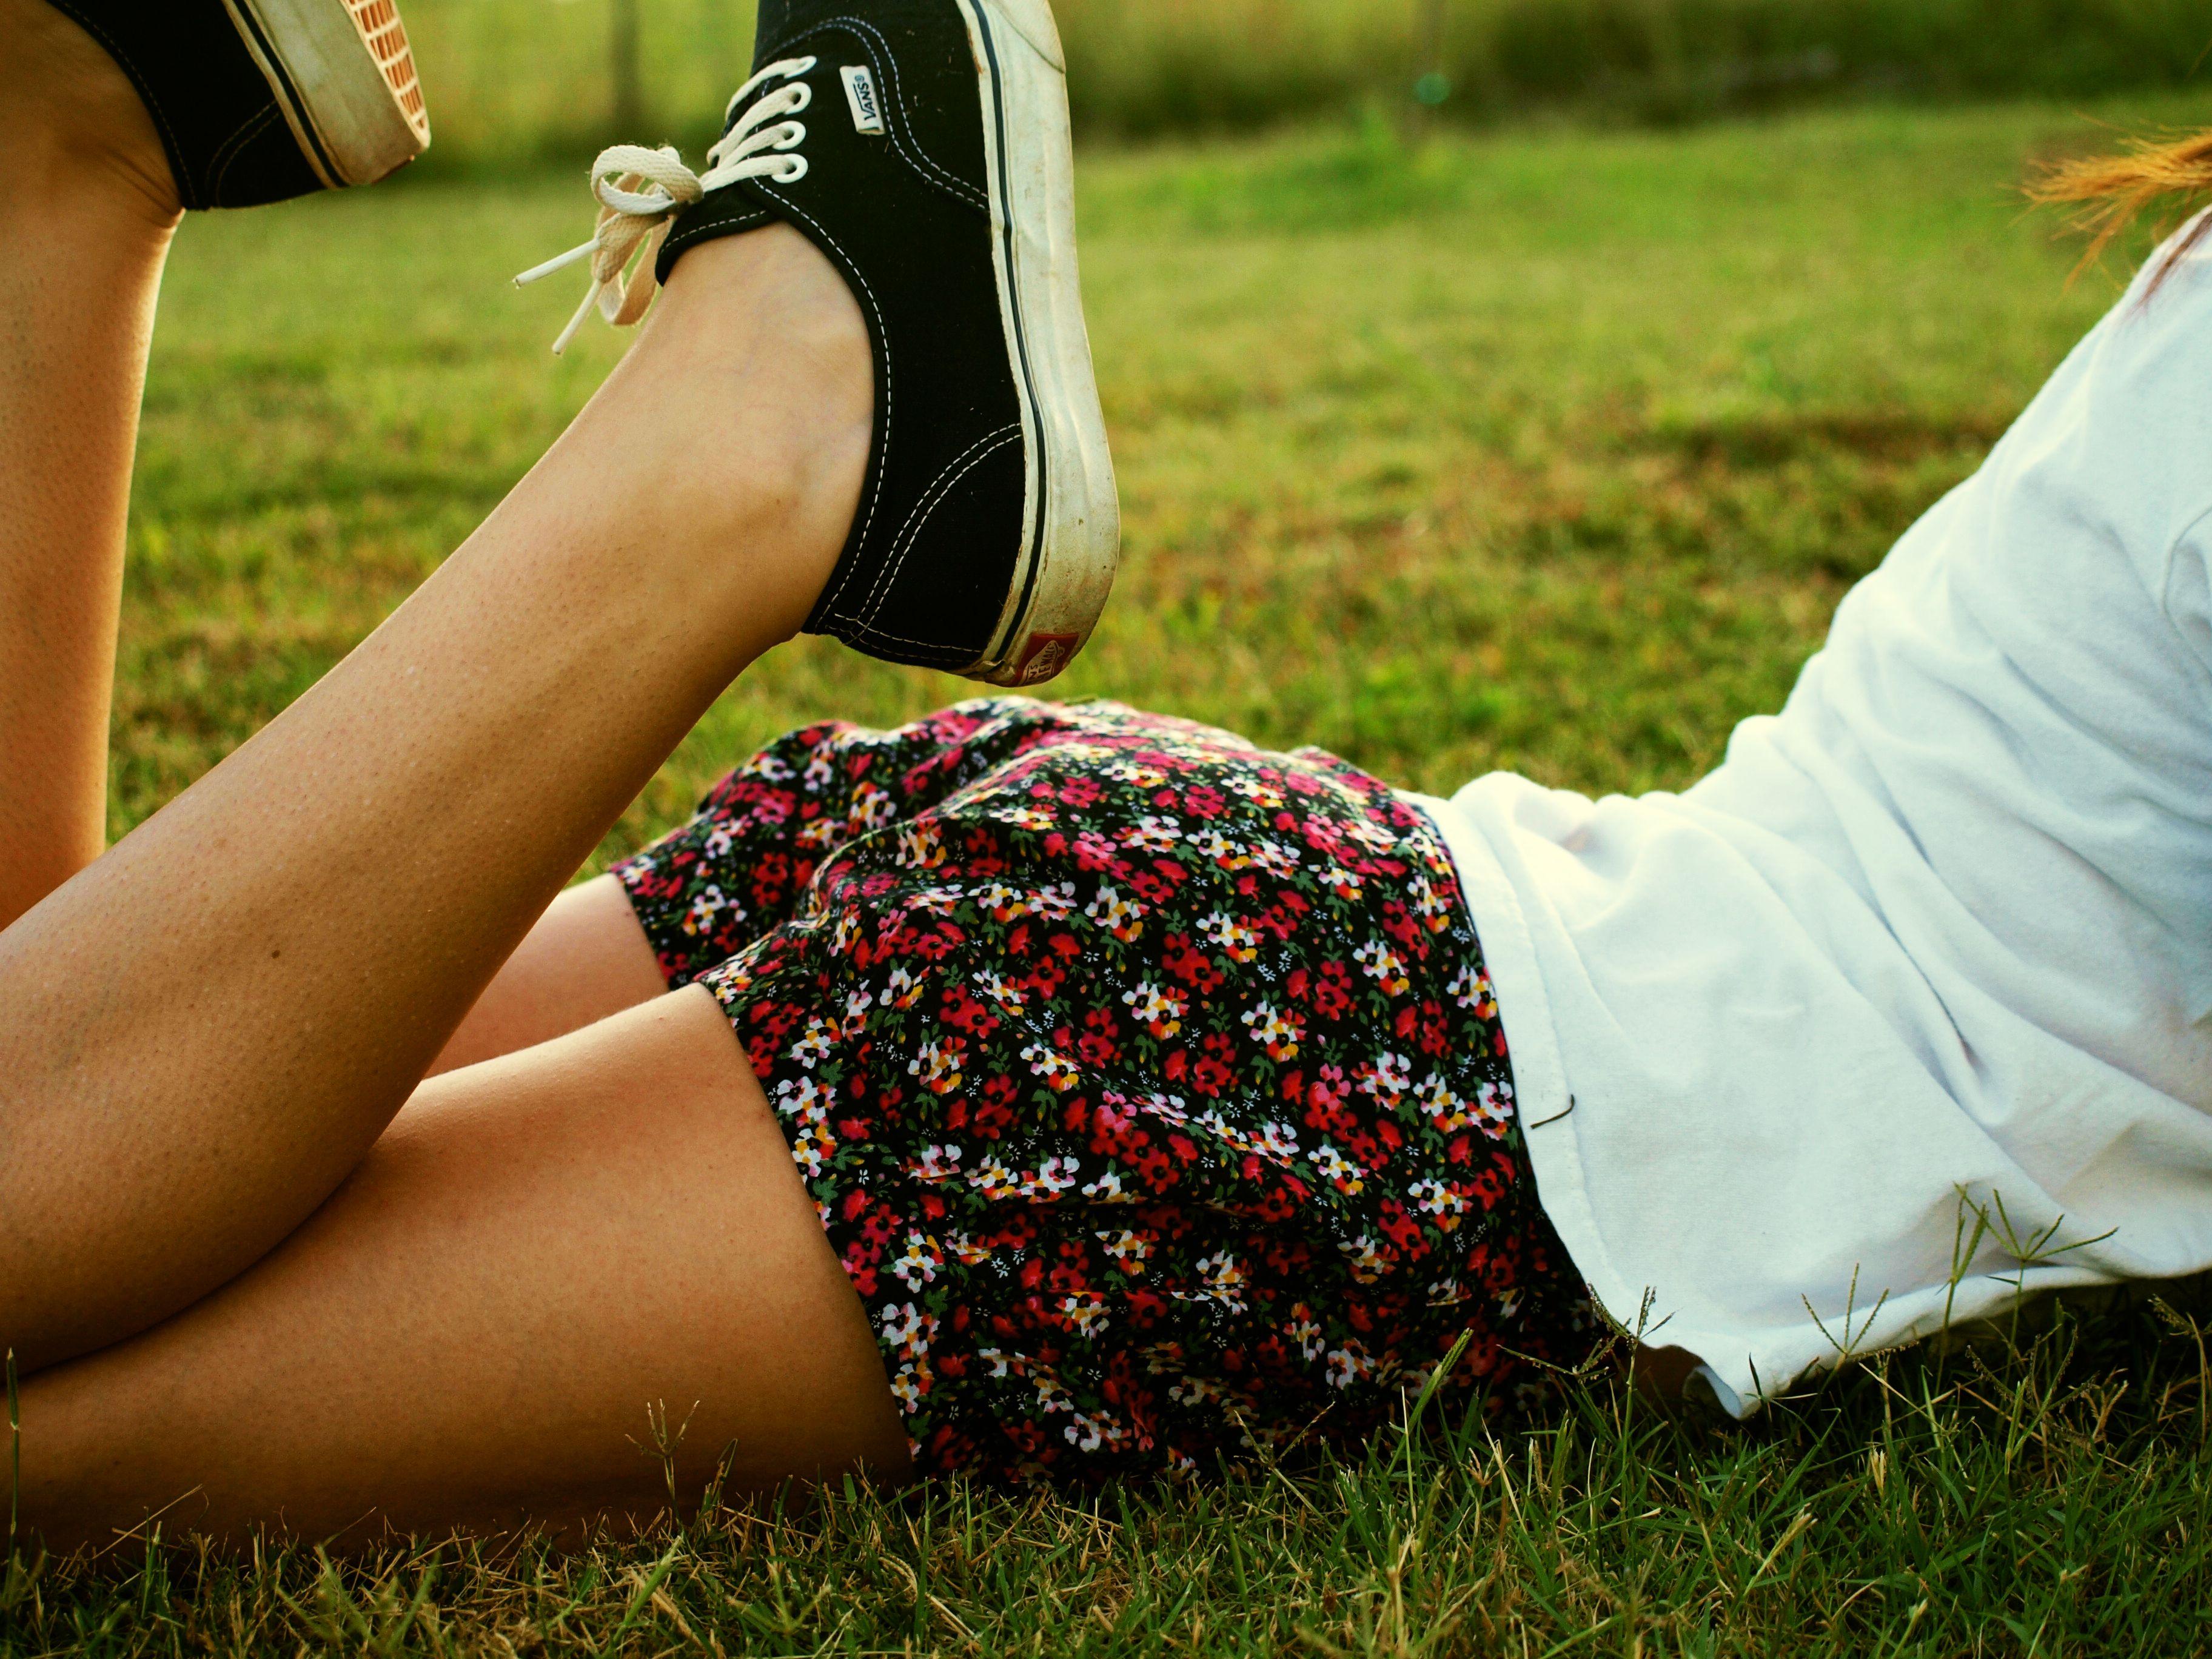 Grass Shorts Summer Vans Spring Person Floral Backyard Beauty Woman Hand Leg July Selfportrait Lawn Human